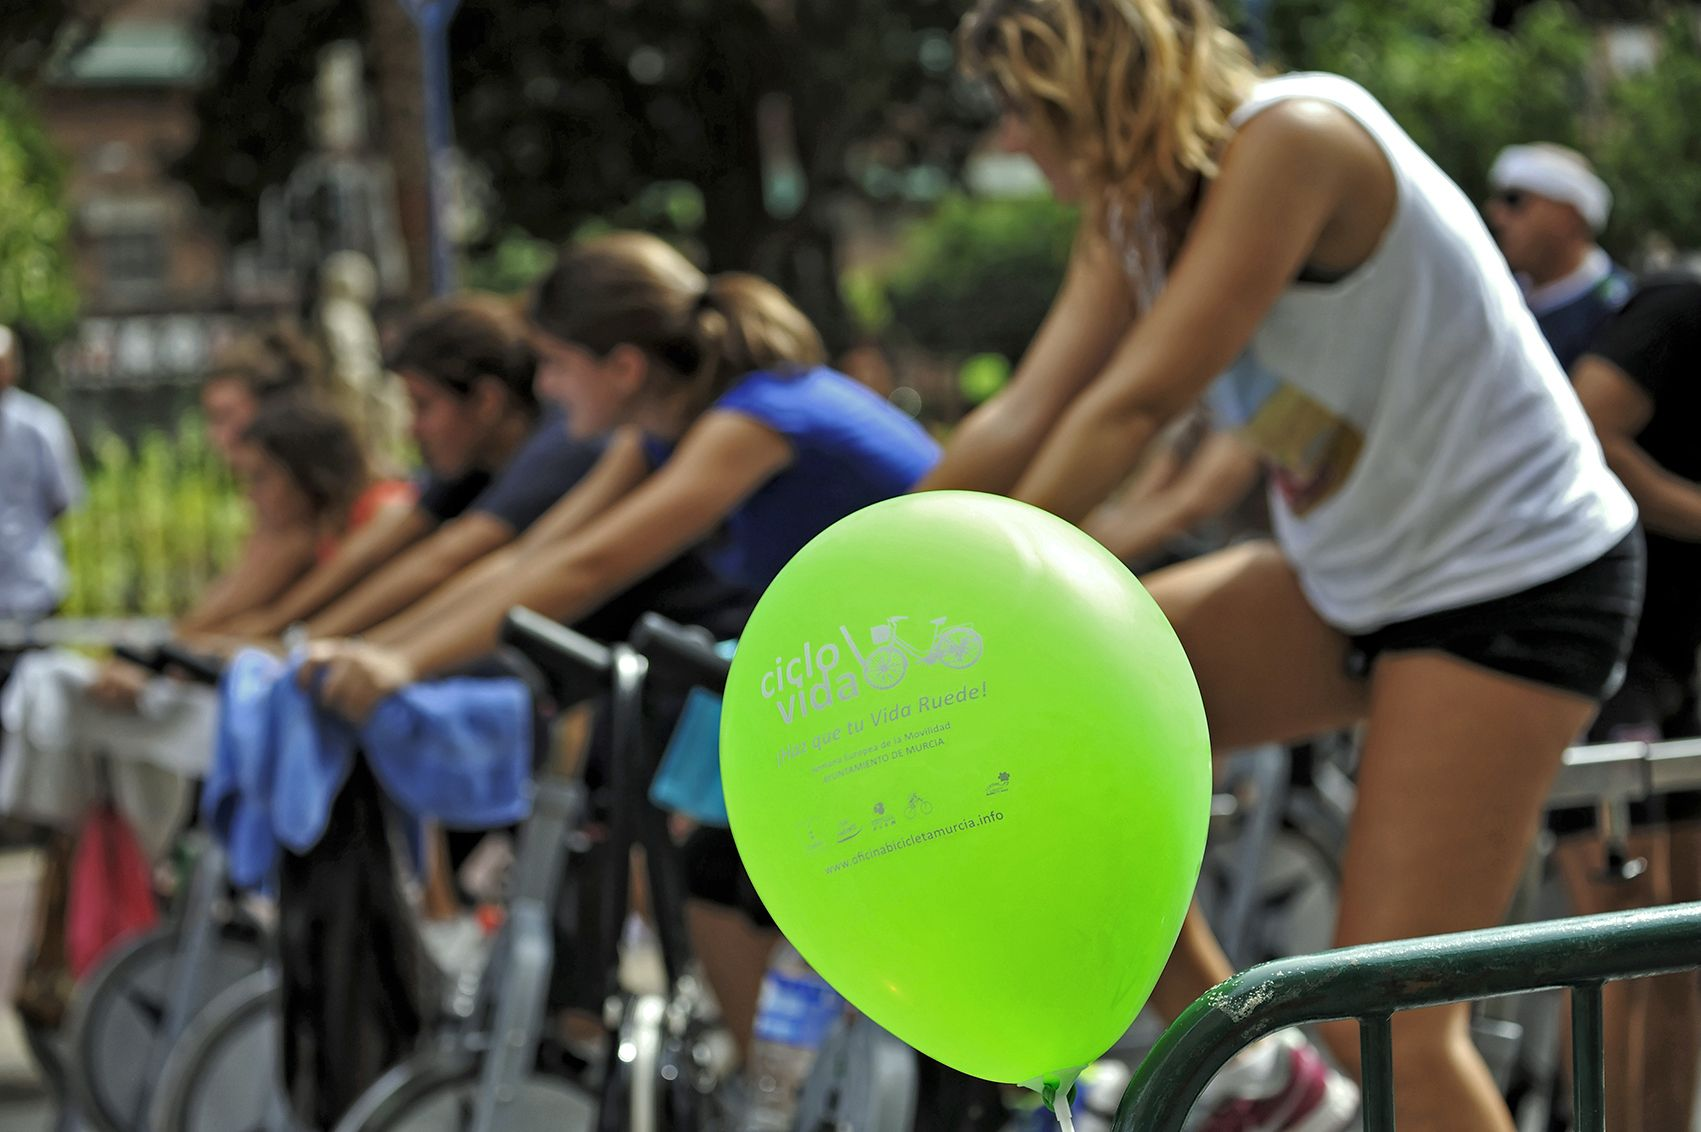 semana-europea-de-la-movilidad-ciclovida